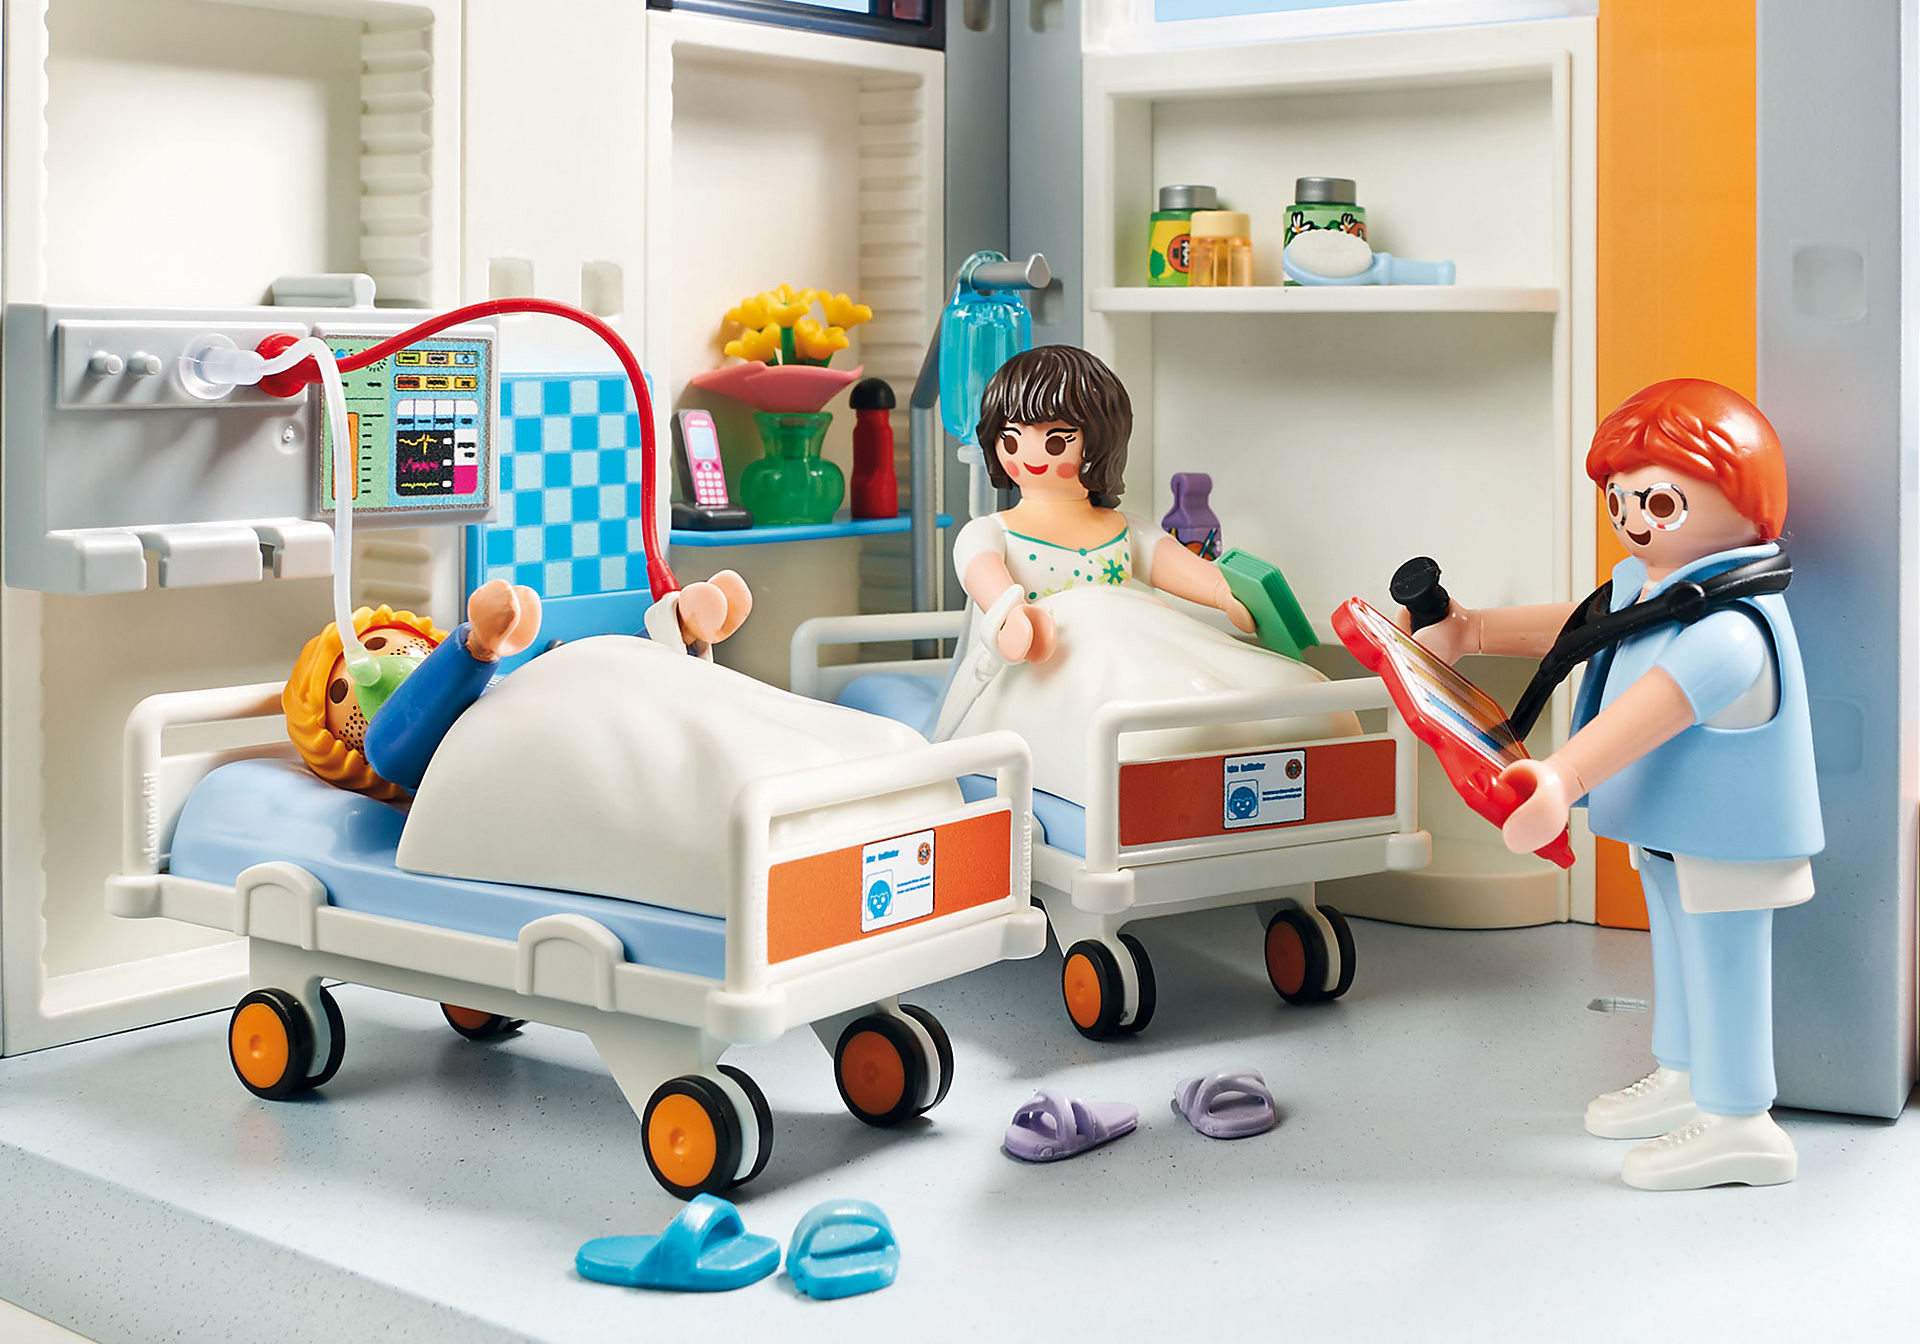 70191 Furnished Hospital Wing zoom image5